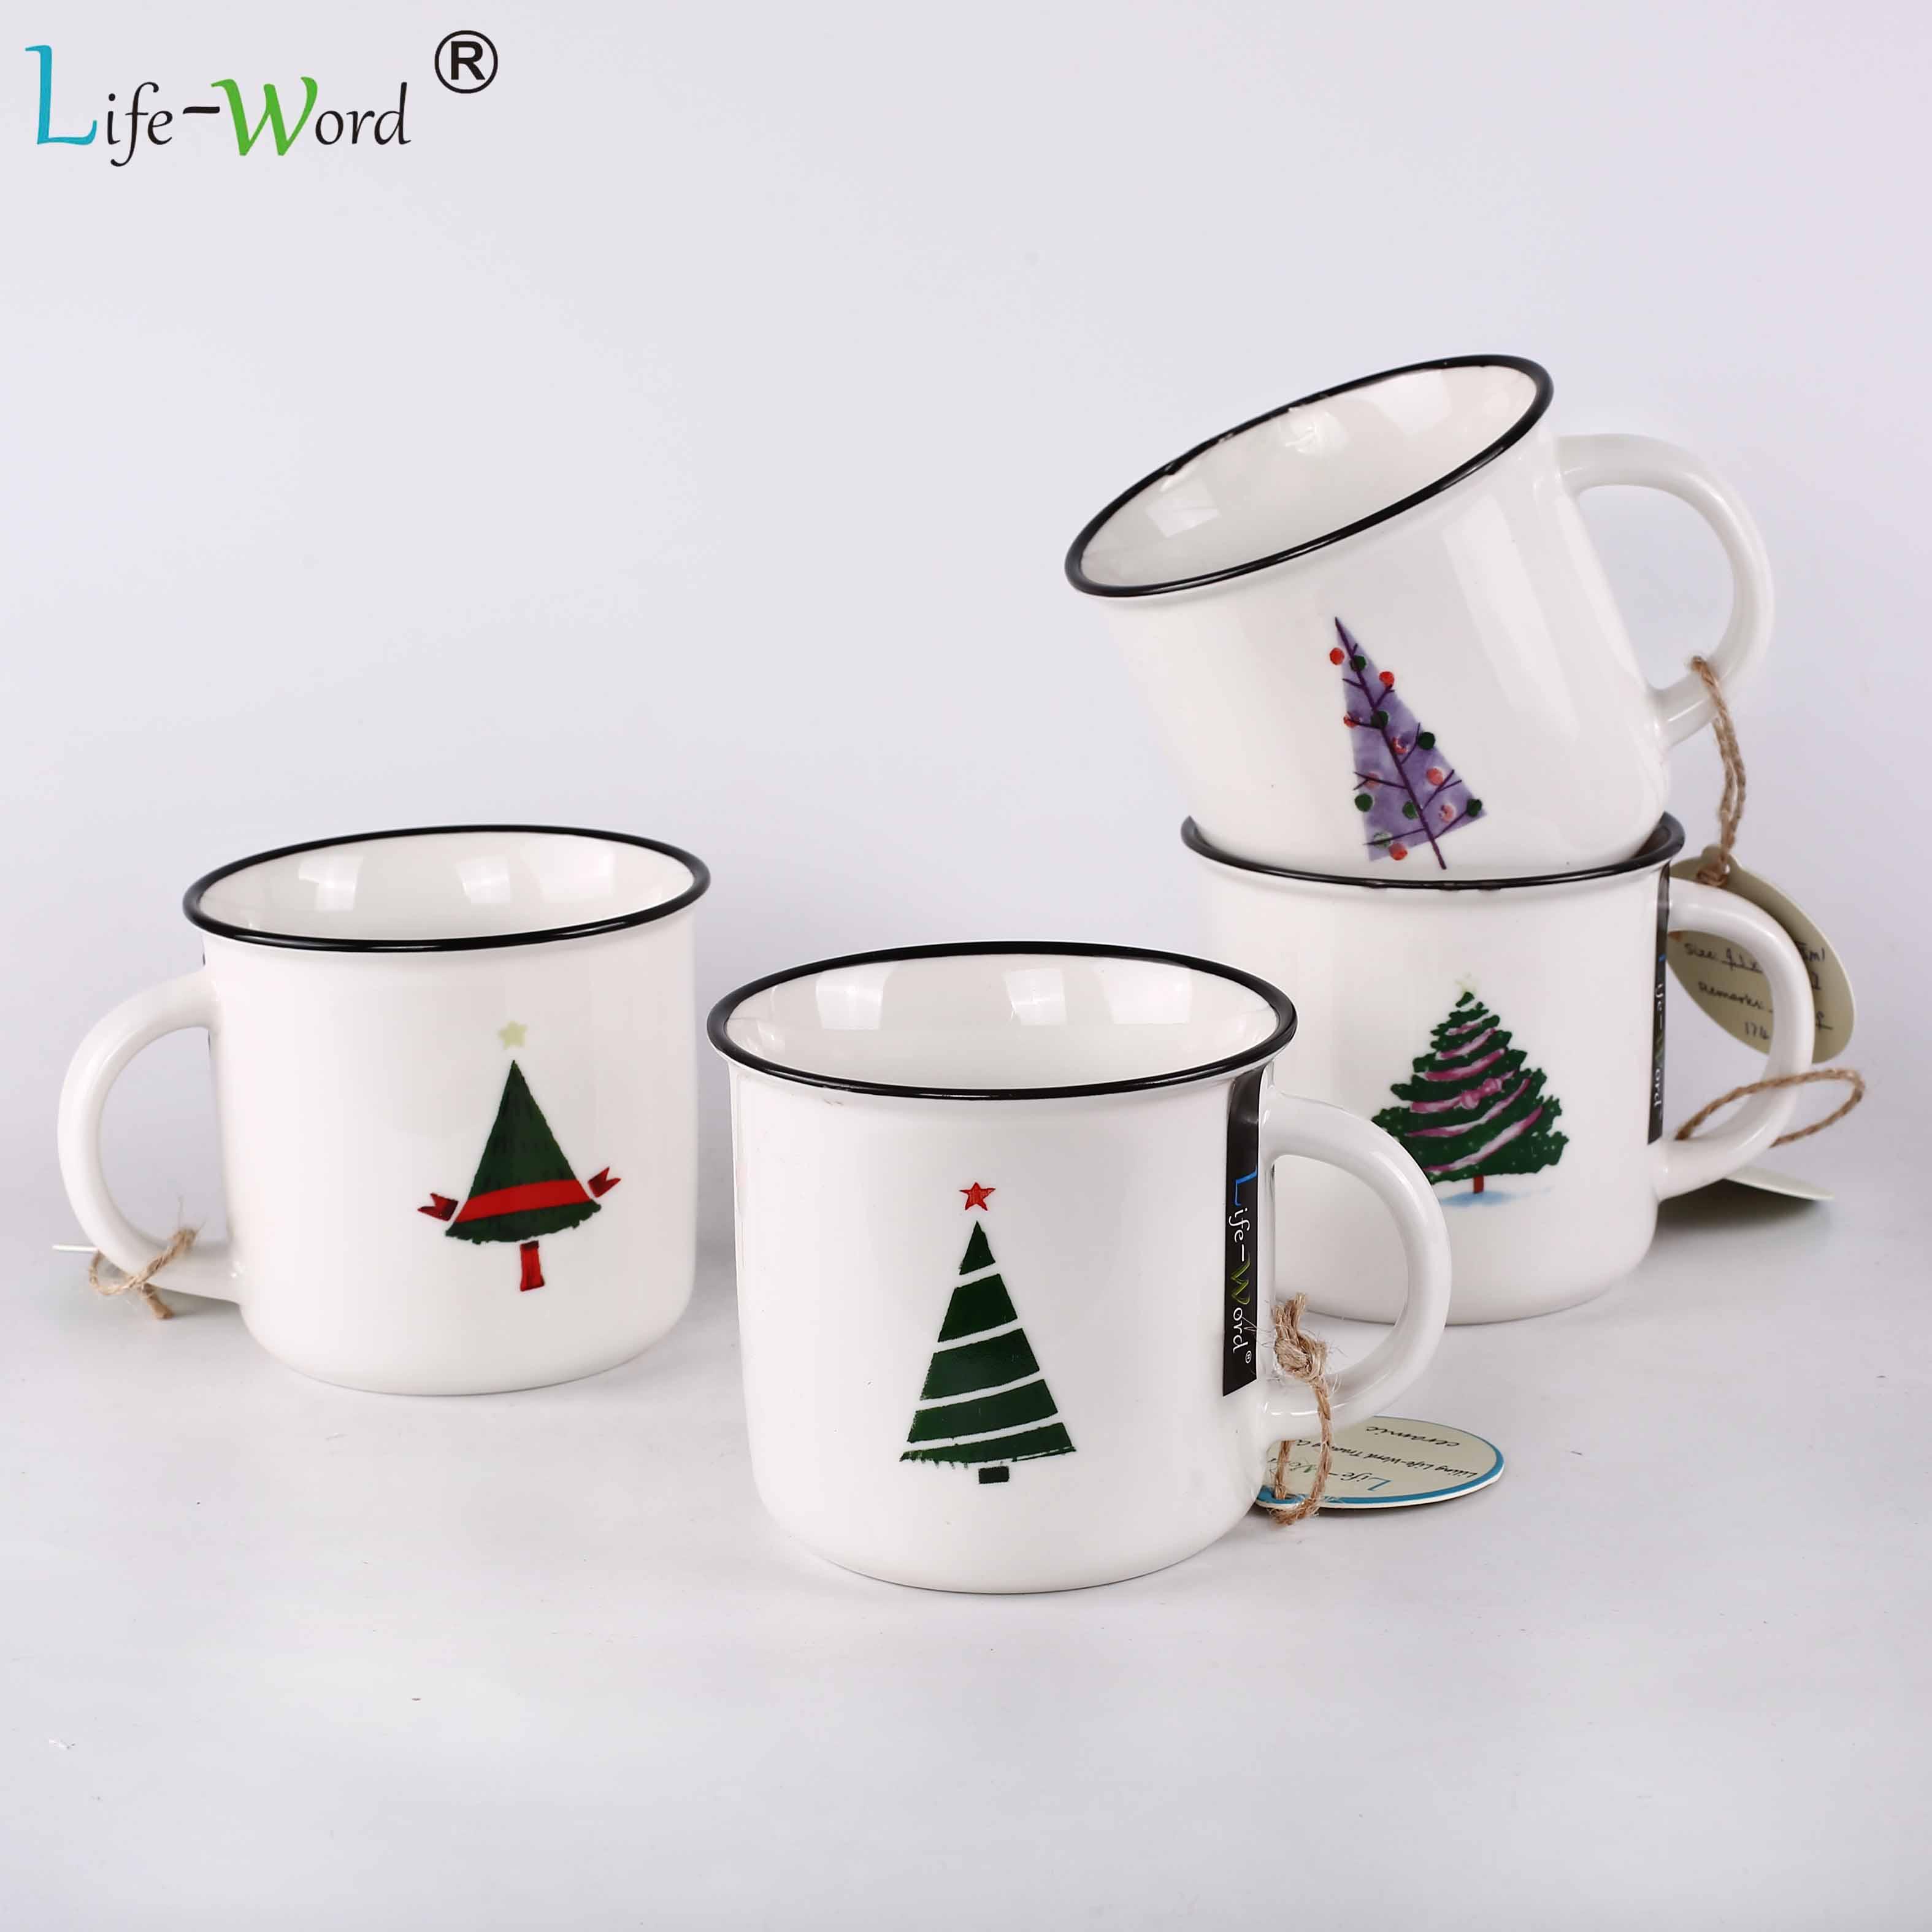 Customized Christmas Coffee Mugs